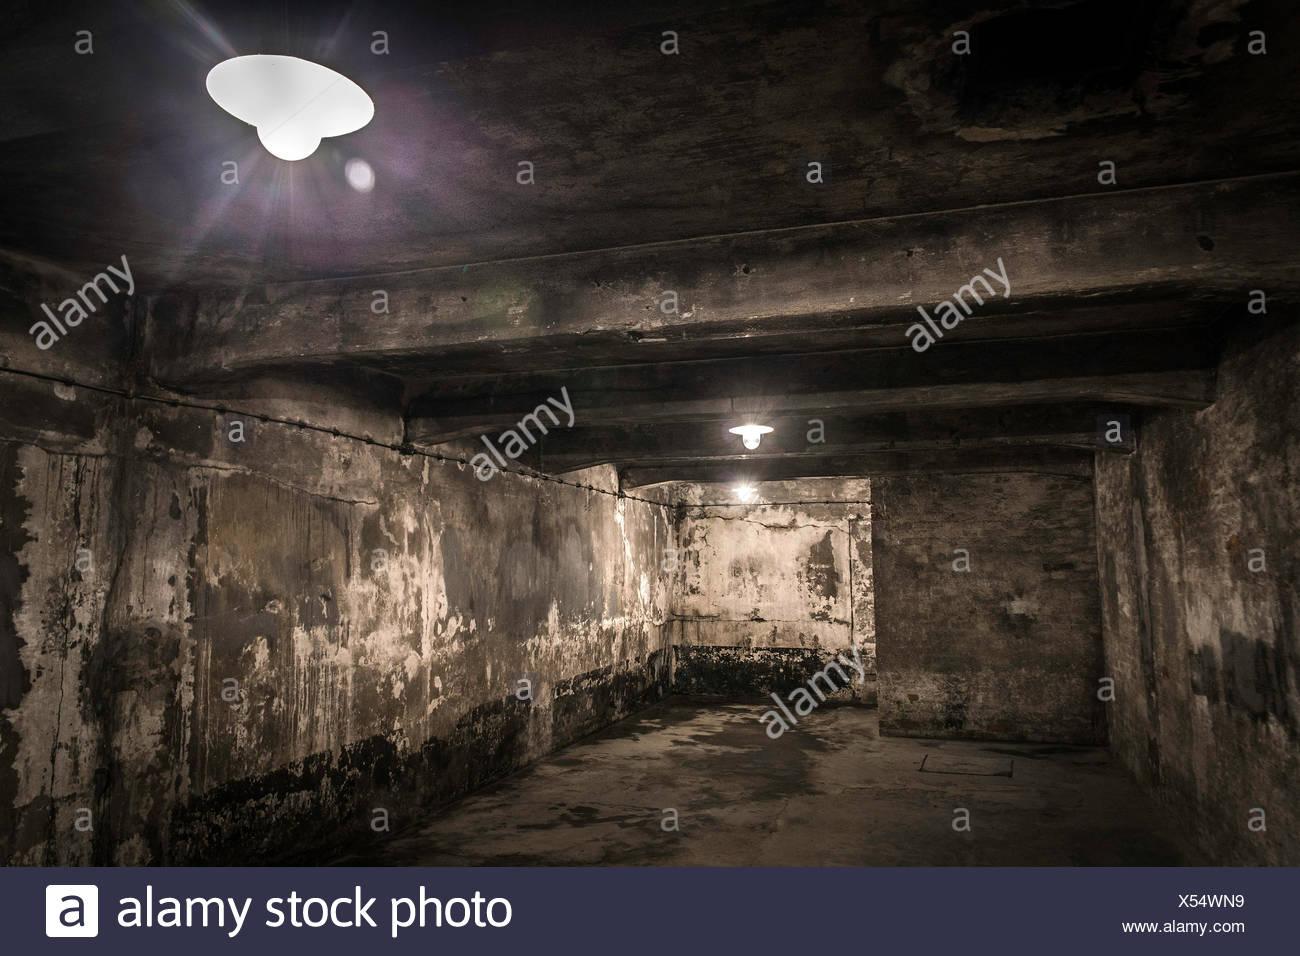 Gas chamber, Auschwitz I extermination camp, Oswiecim, Poland - Stock Image